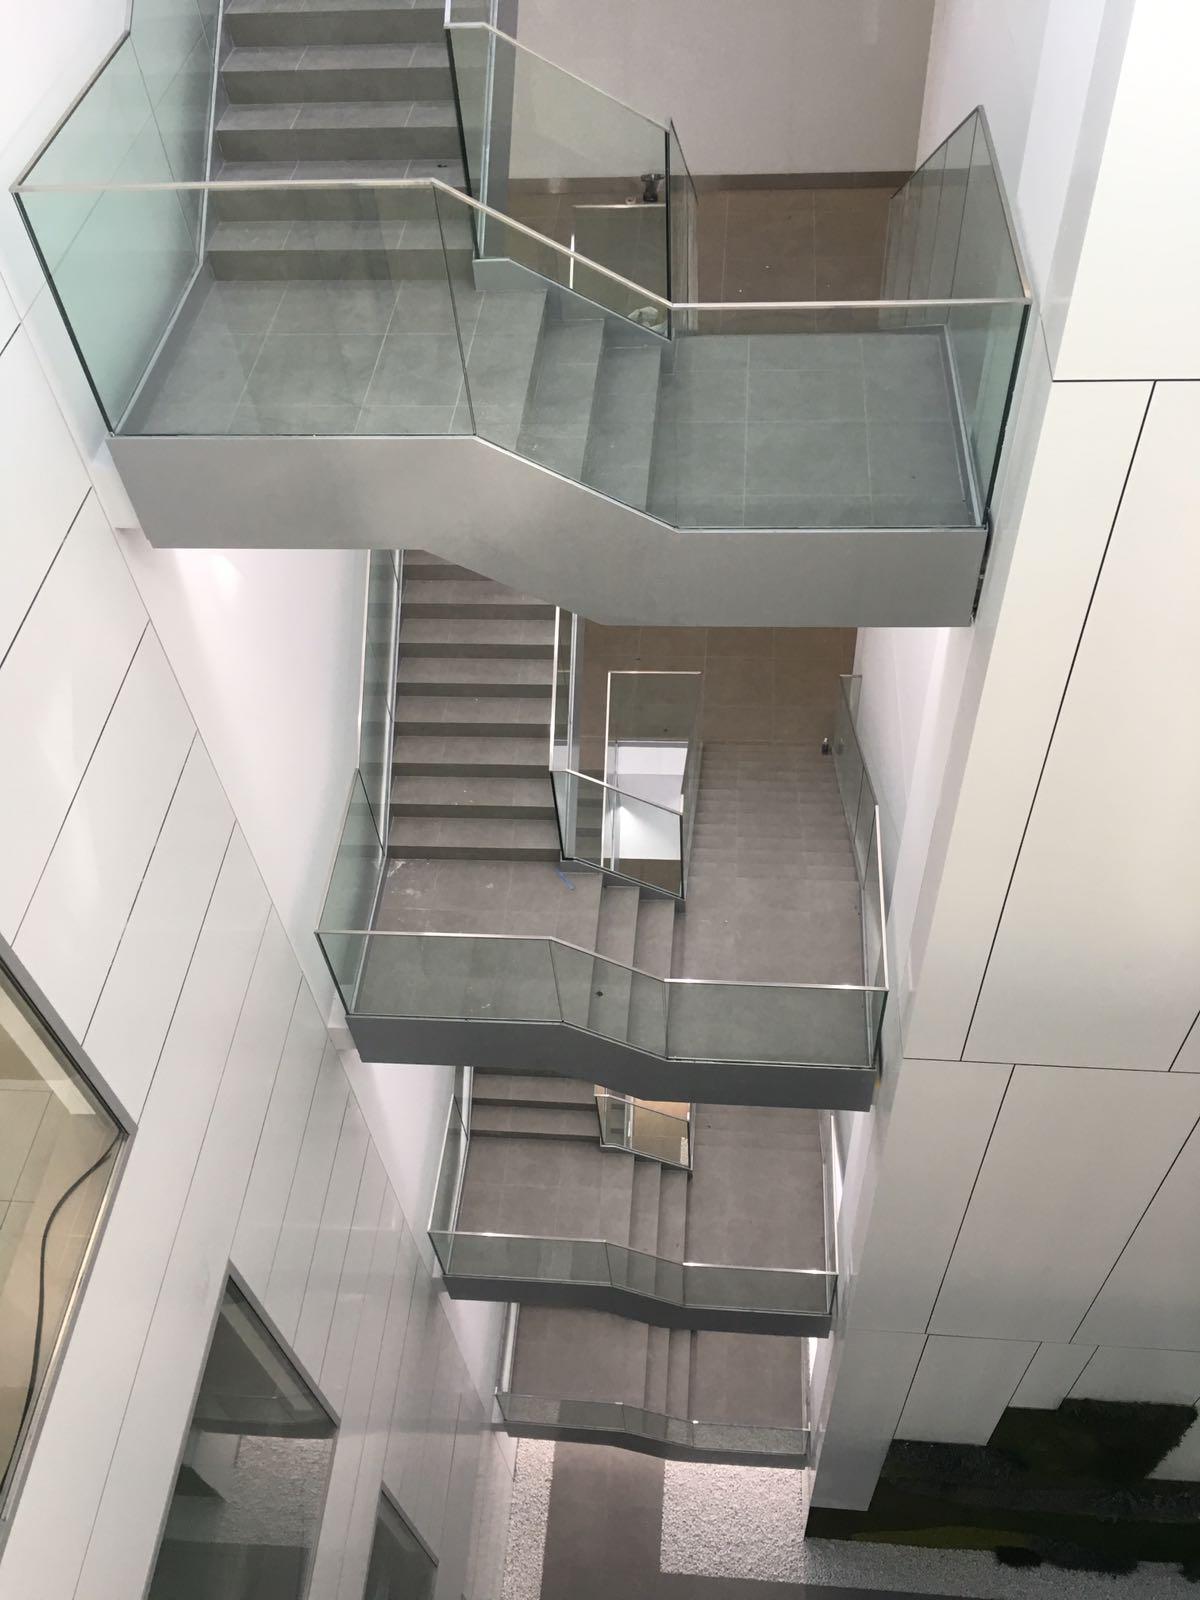 Particularidades de una escalera protegida en planta baja